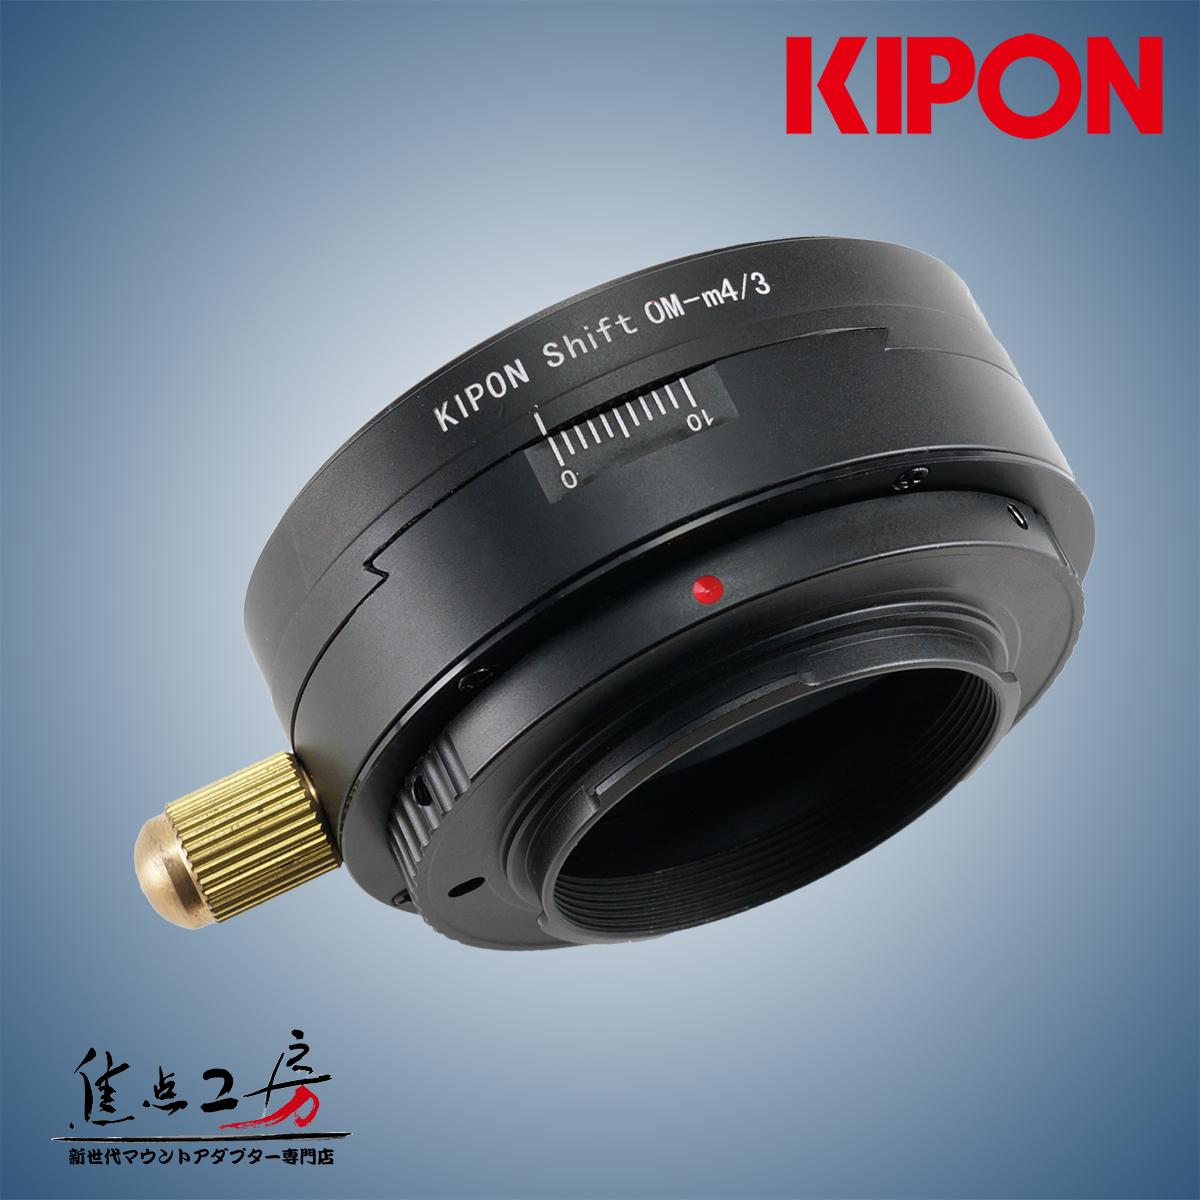 KIPON (kepong) Olympus OM mount - micro four-thirds mount adapter (shift)  tilt mechanism